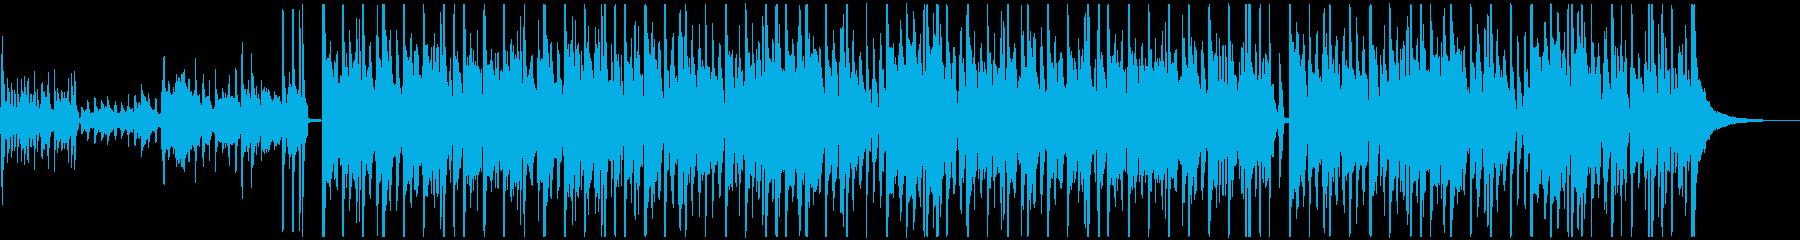 Vagabondの再生済みの波形